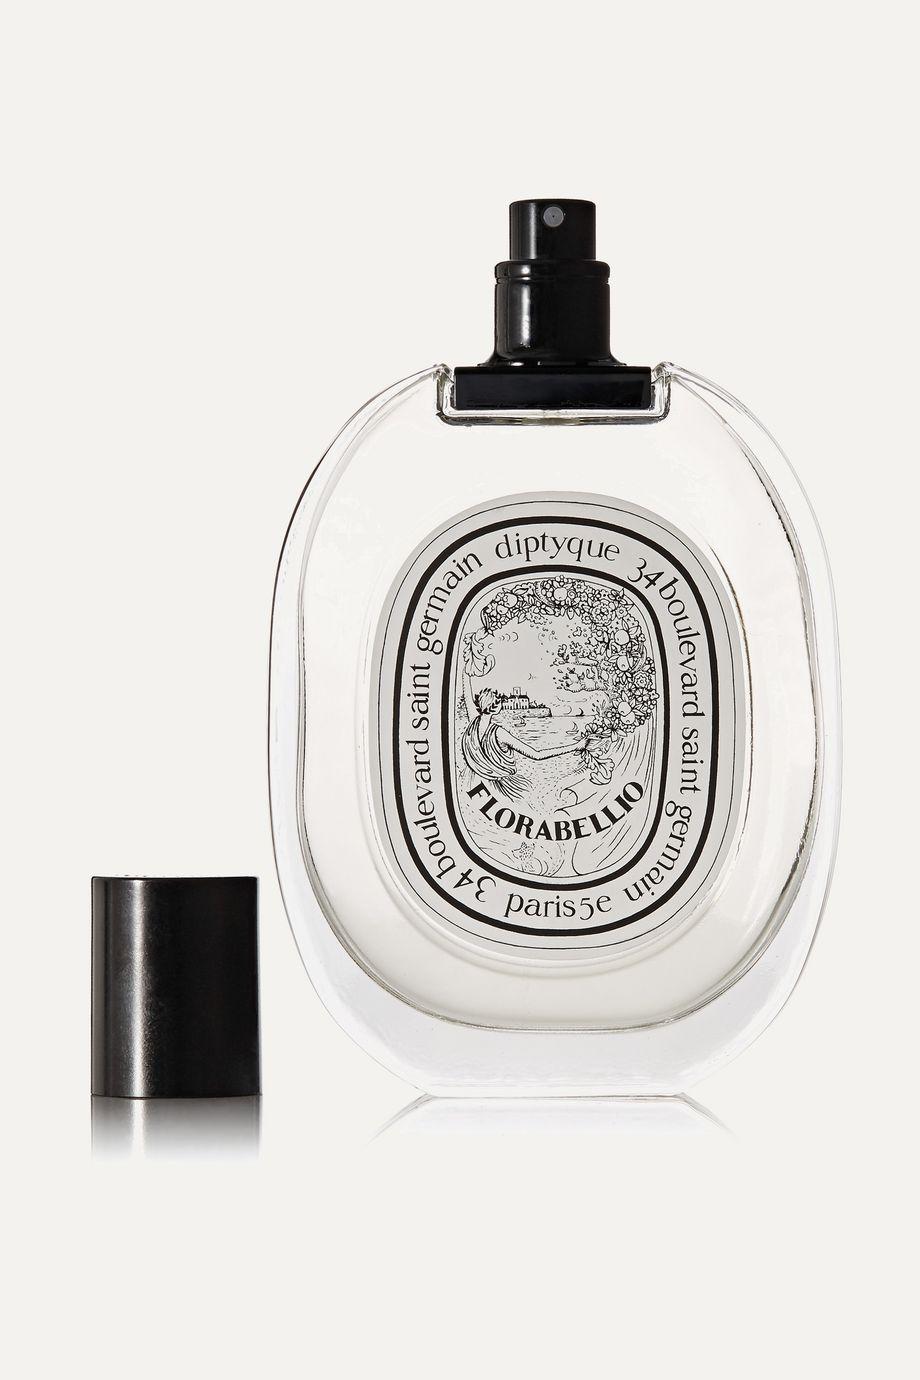 Diptyque Florabellio Eau de Toilette - Apple Blossom, Marine Accord & Coffee, 100ml